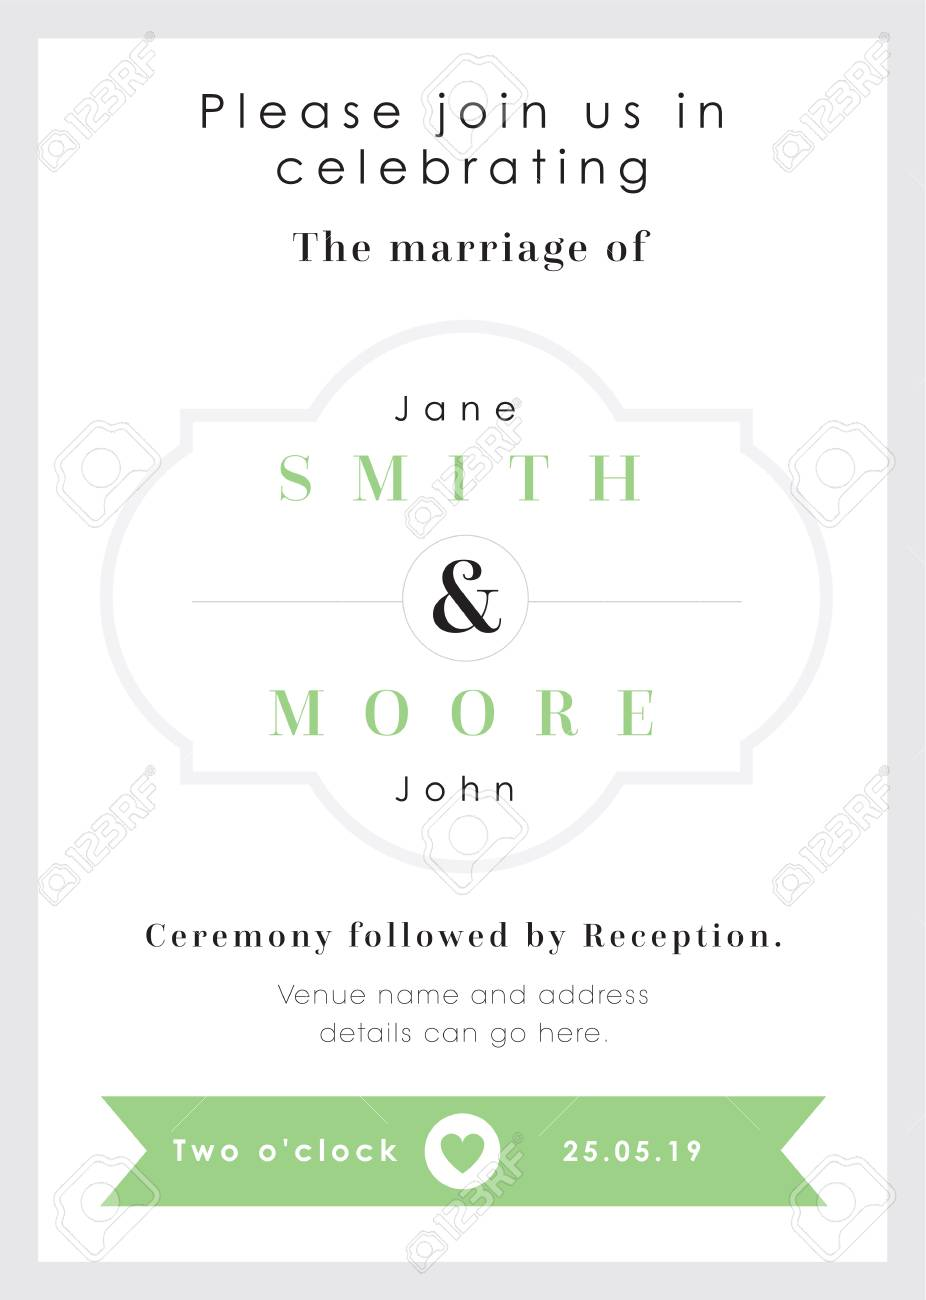 Green Heart Theme - Wedding Invitation Royalty Free Cliparts ...